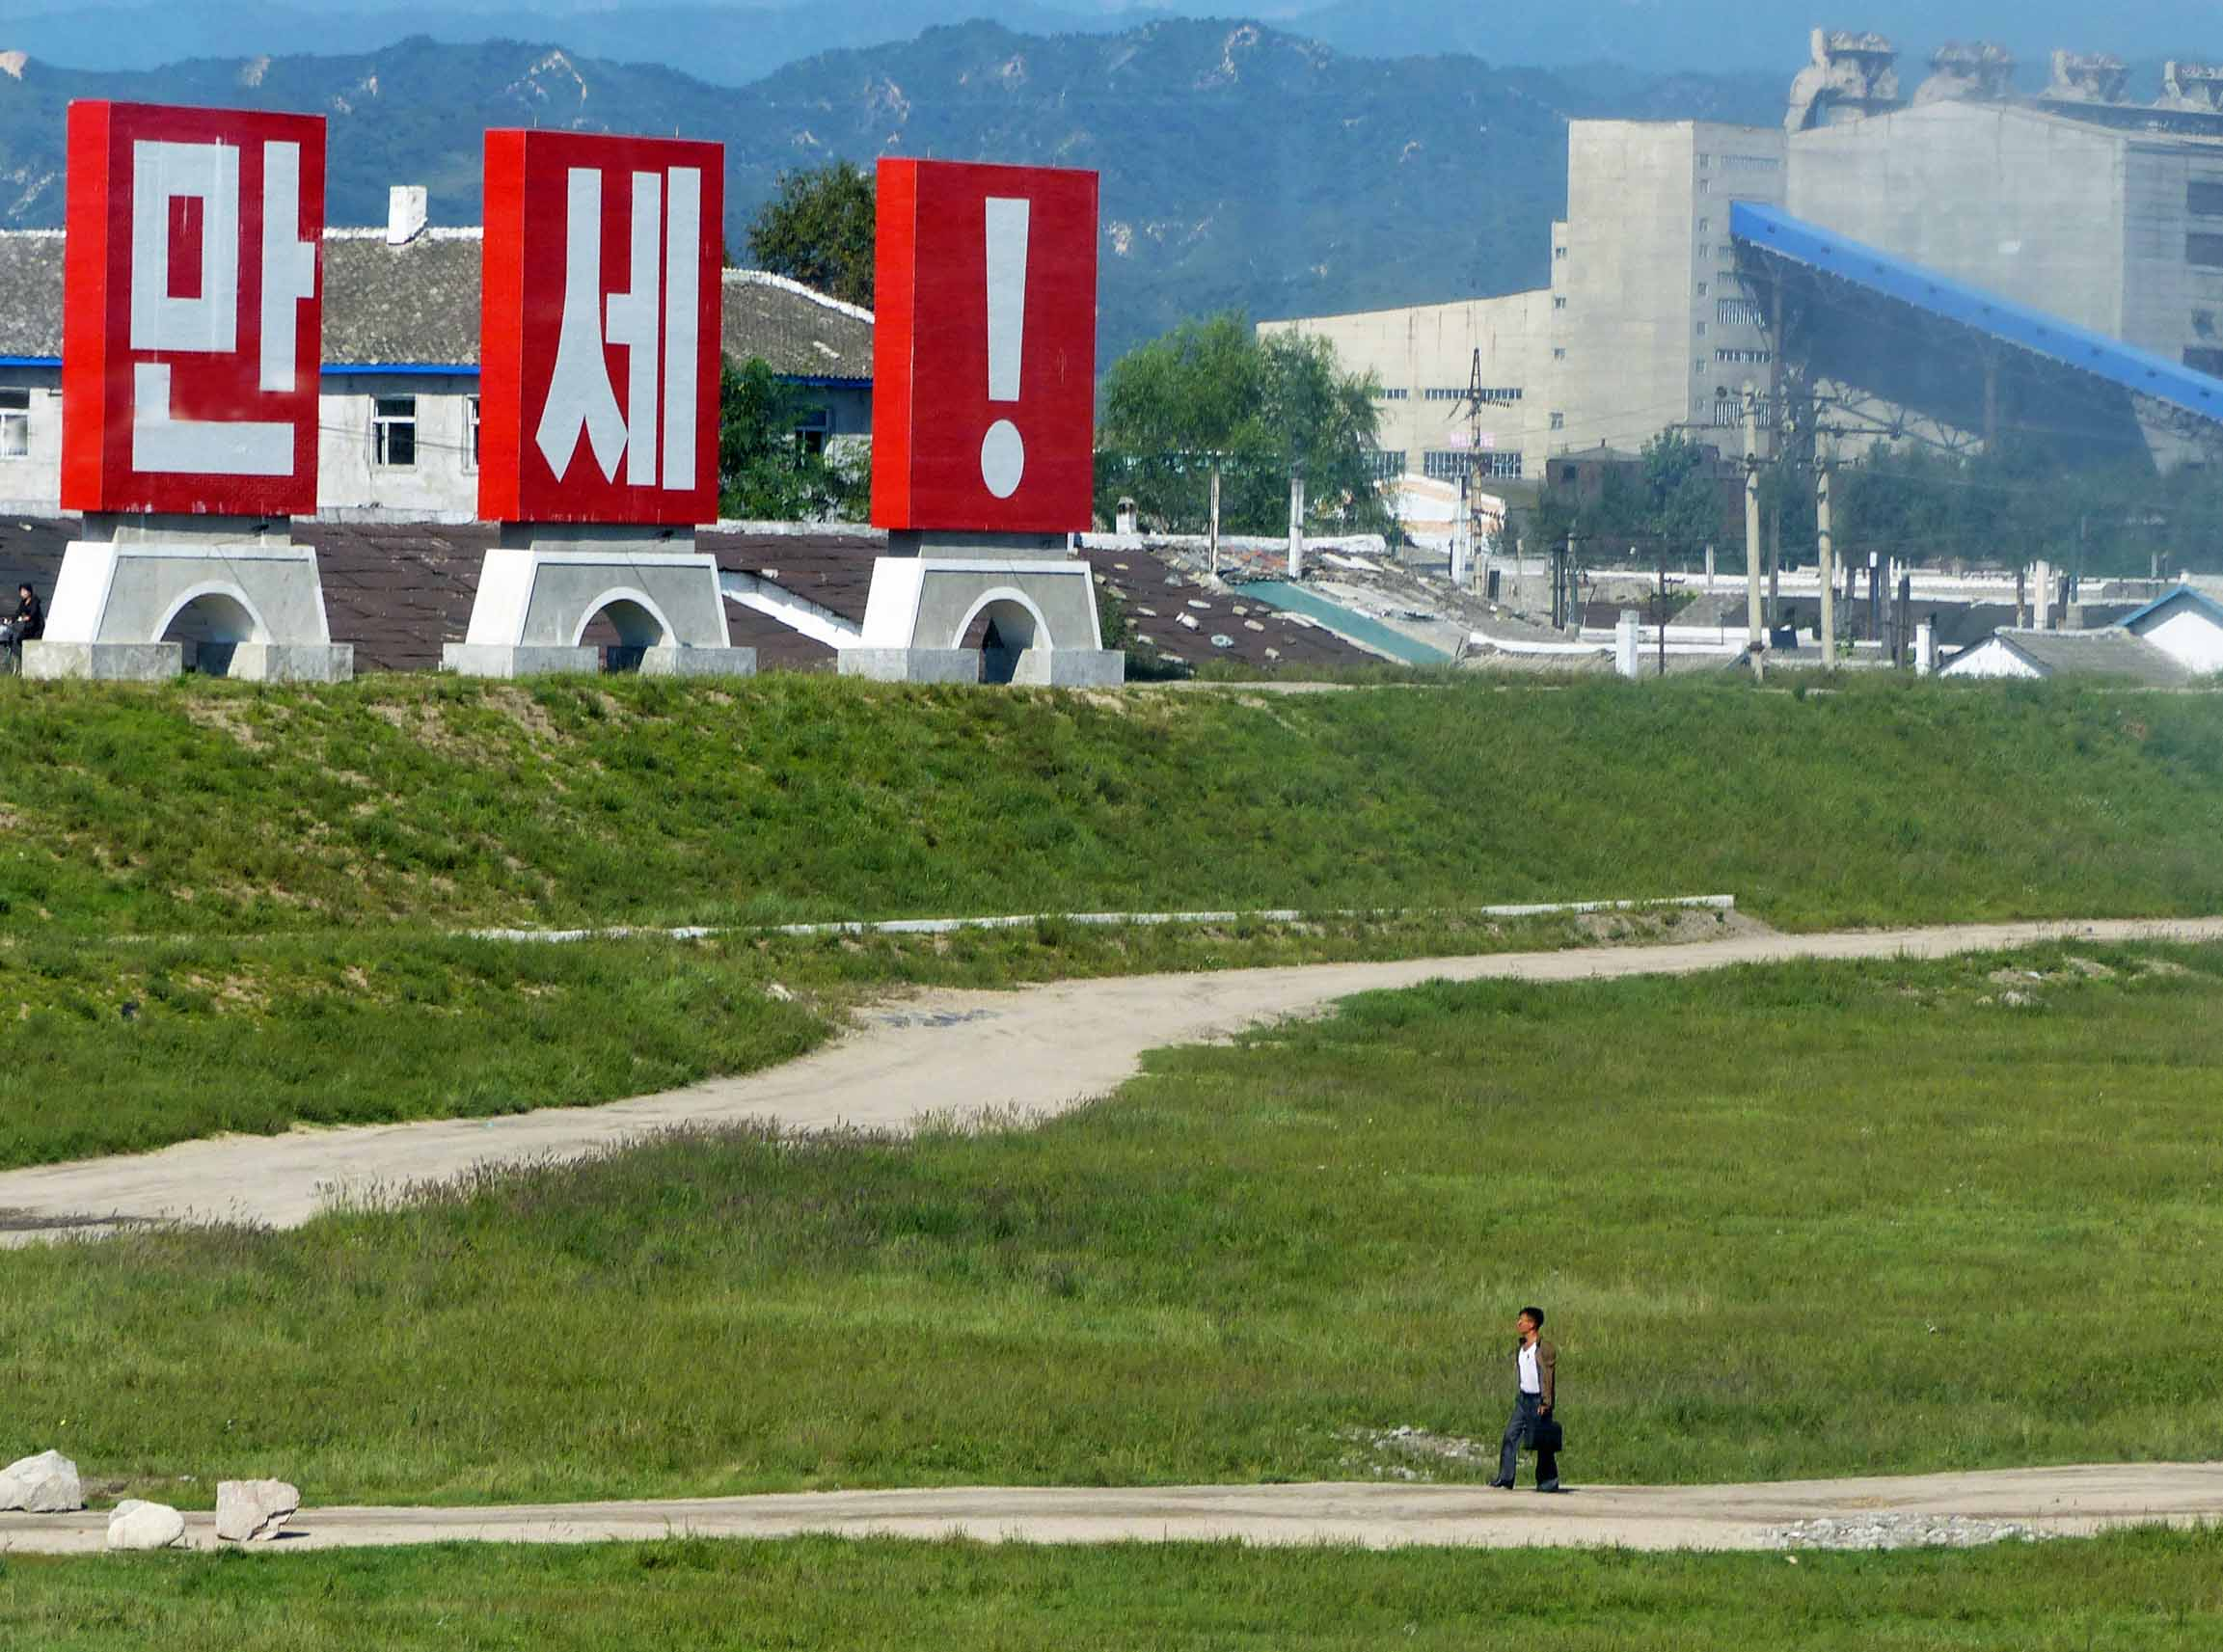 Man walking past huge red Korean characters and factories